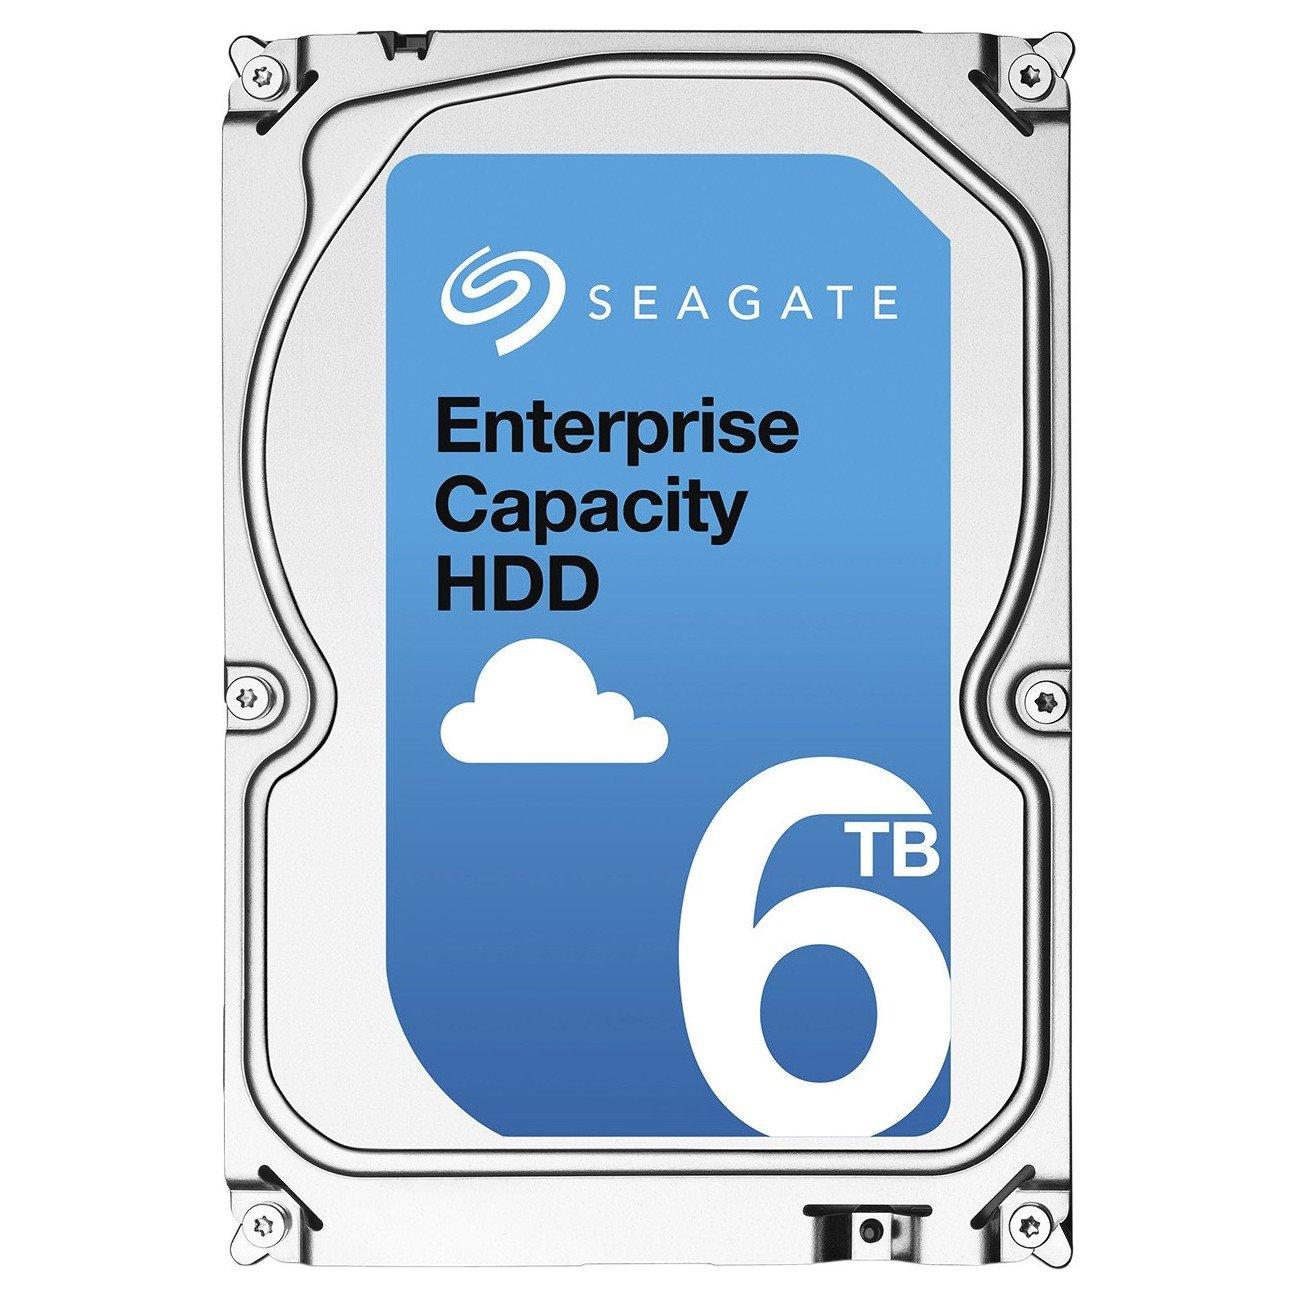 "Seagate 6 TB Hard Drive - 3.5"" Drive - Internal"